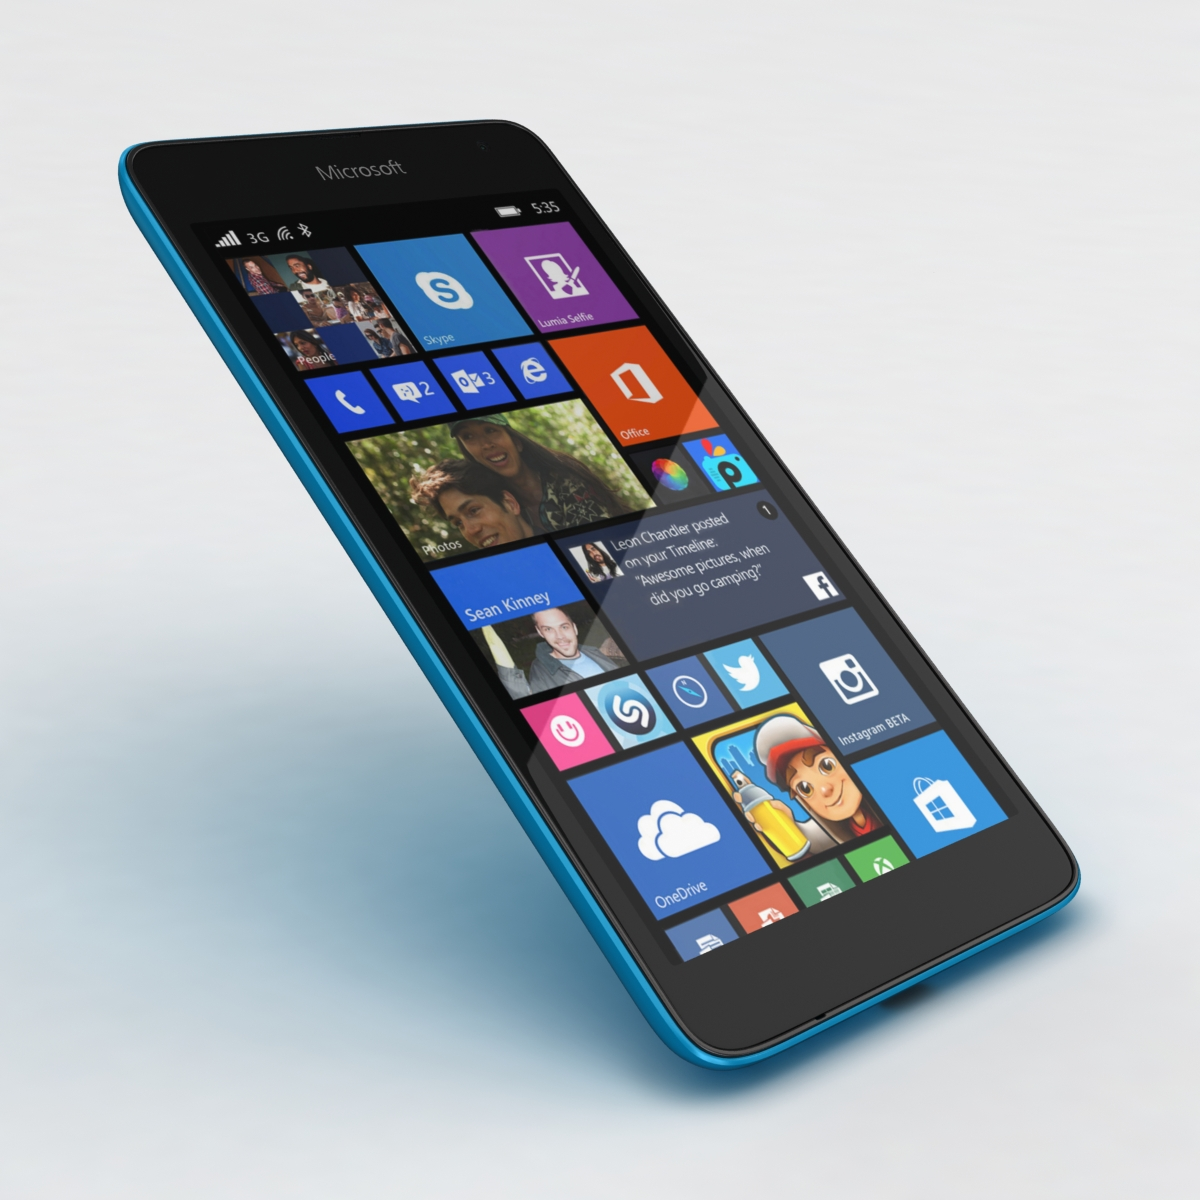 microsoft lumia 535 and dual sim blue 3d model 3ds max fbx c4d obj 204533